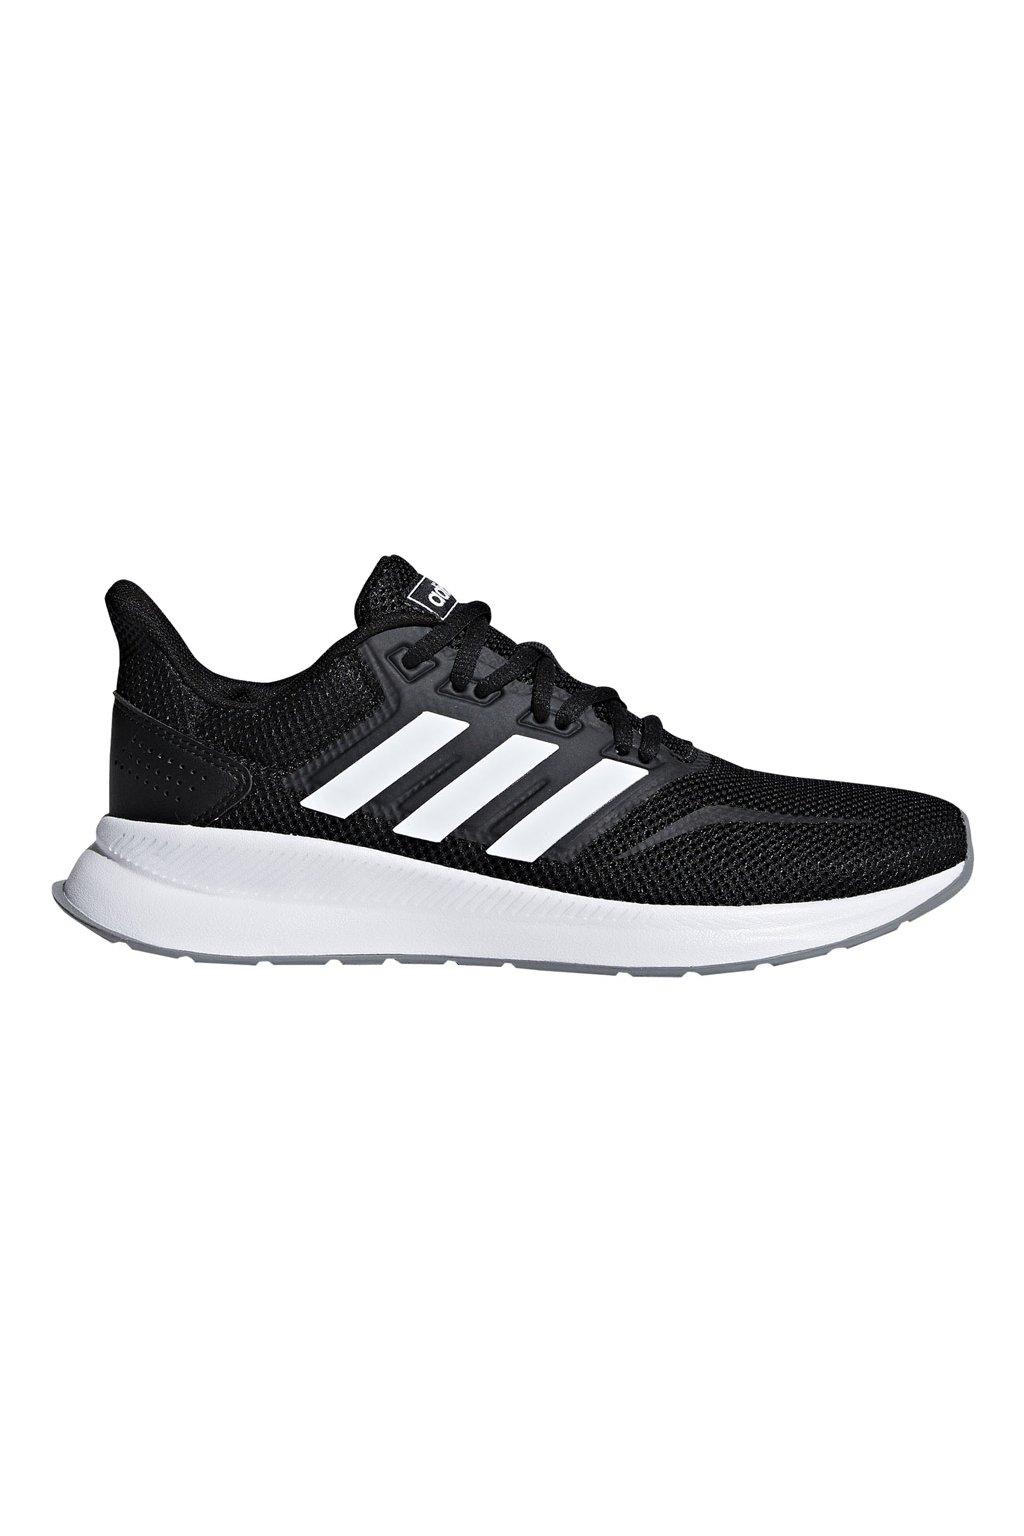 Dámska bežecká obuv Adidas Runfalcon black F36218